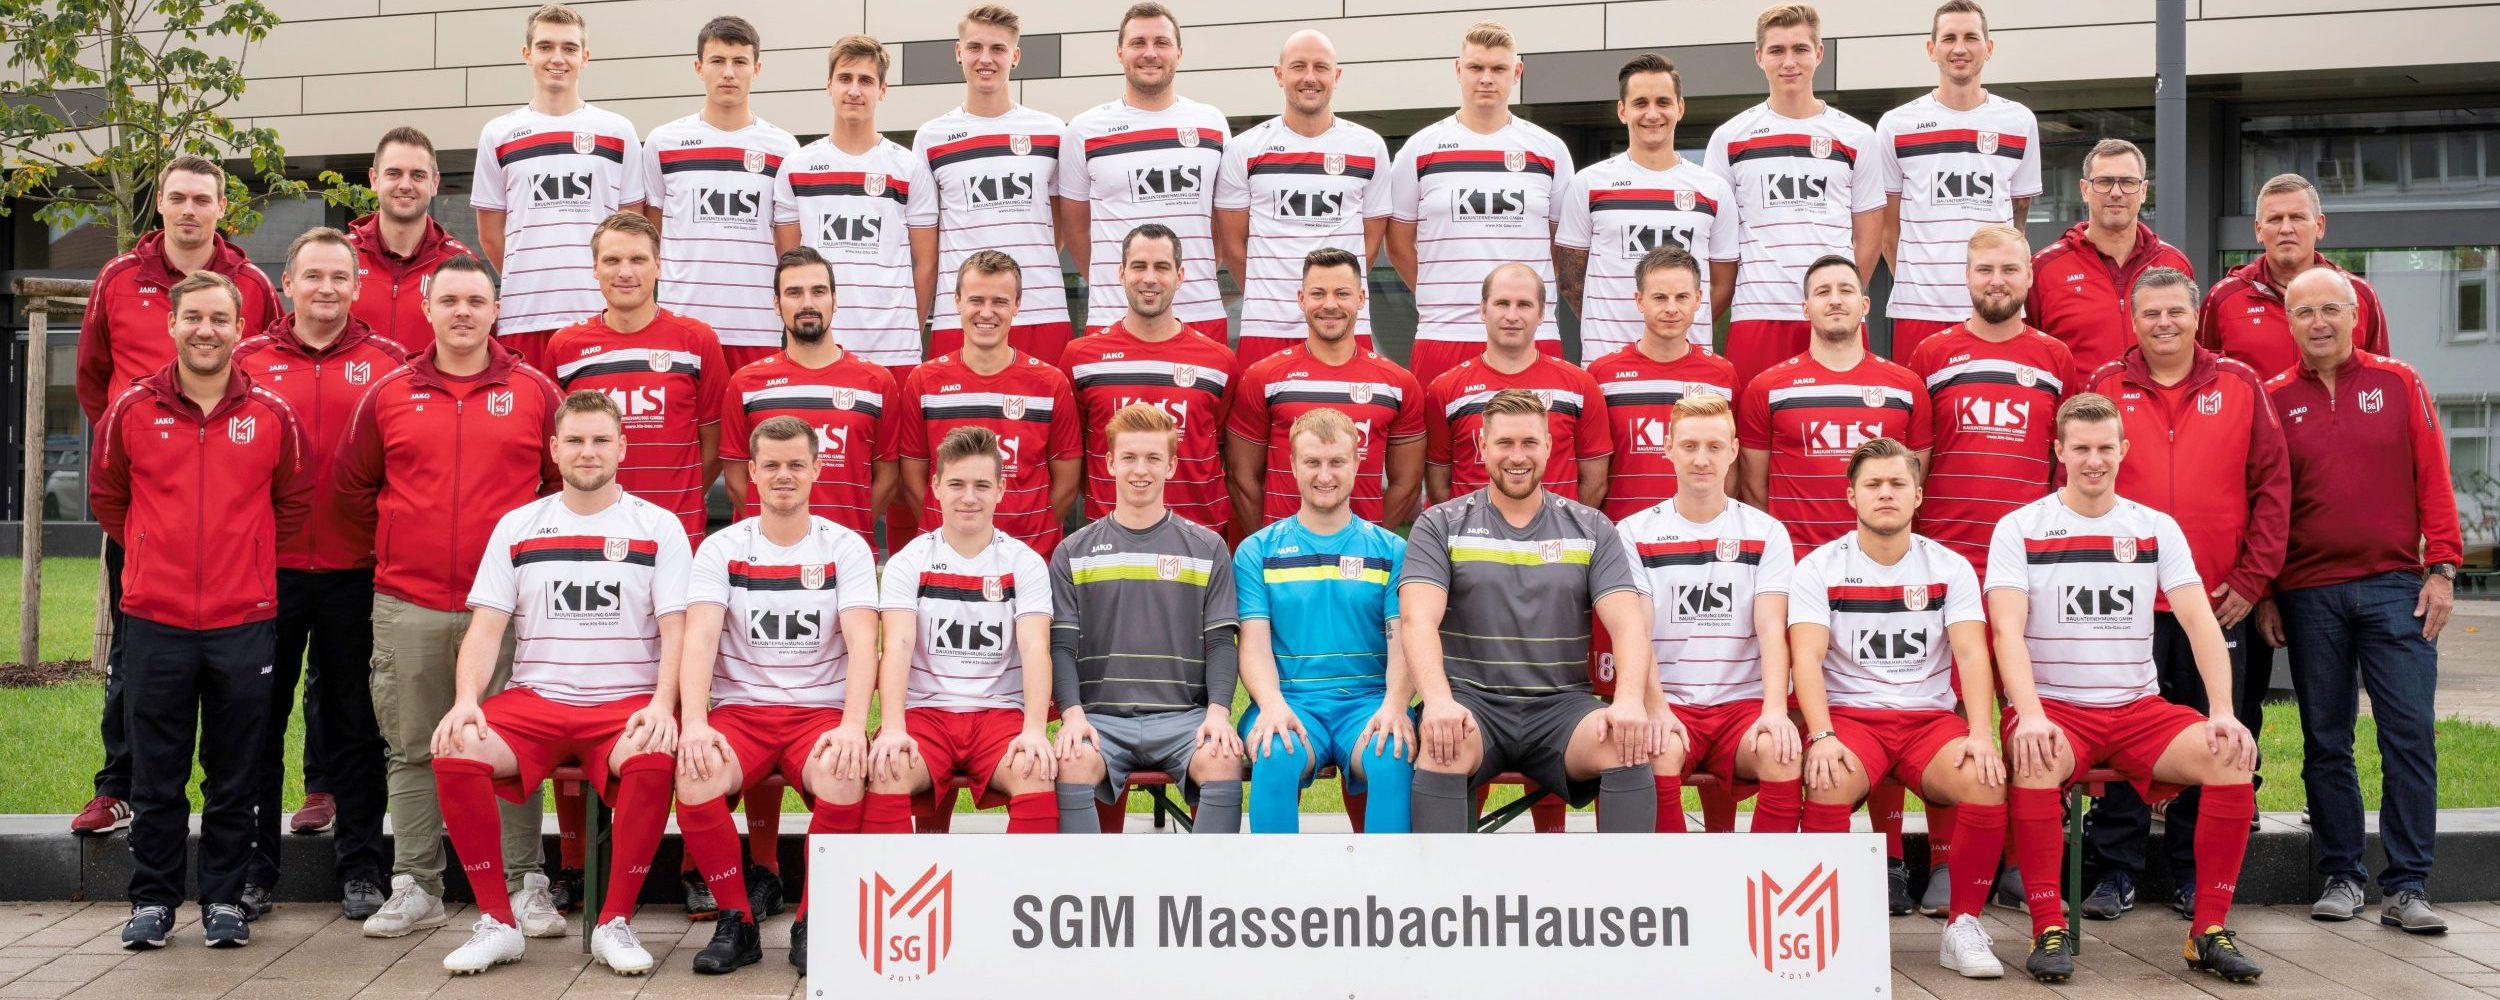 SGMMassenbachHausen-1920-Herren